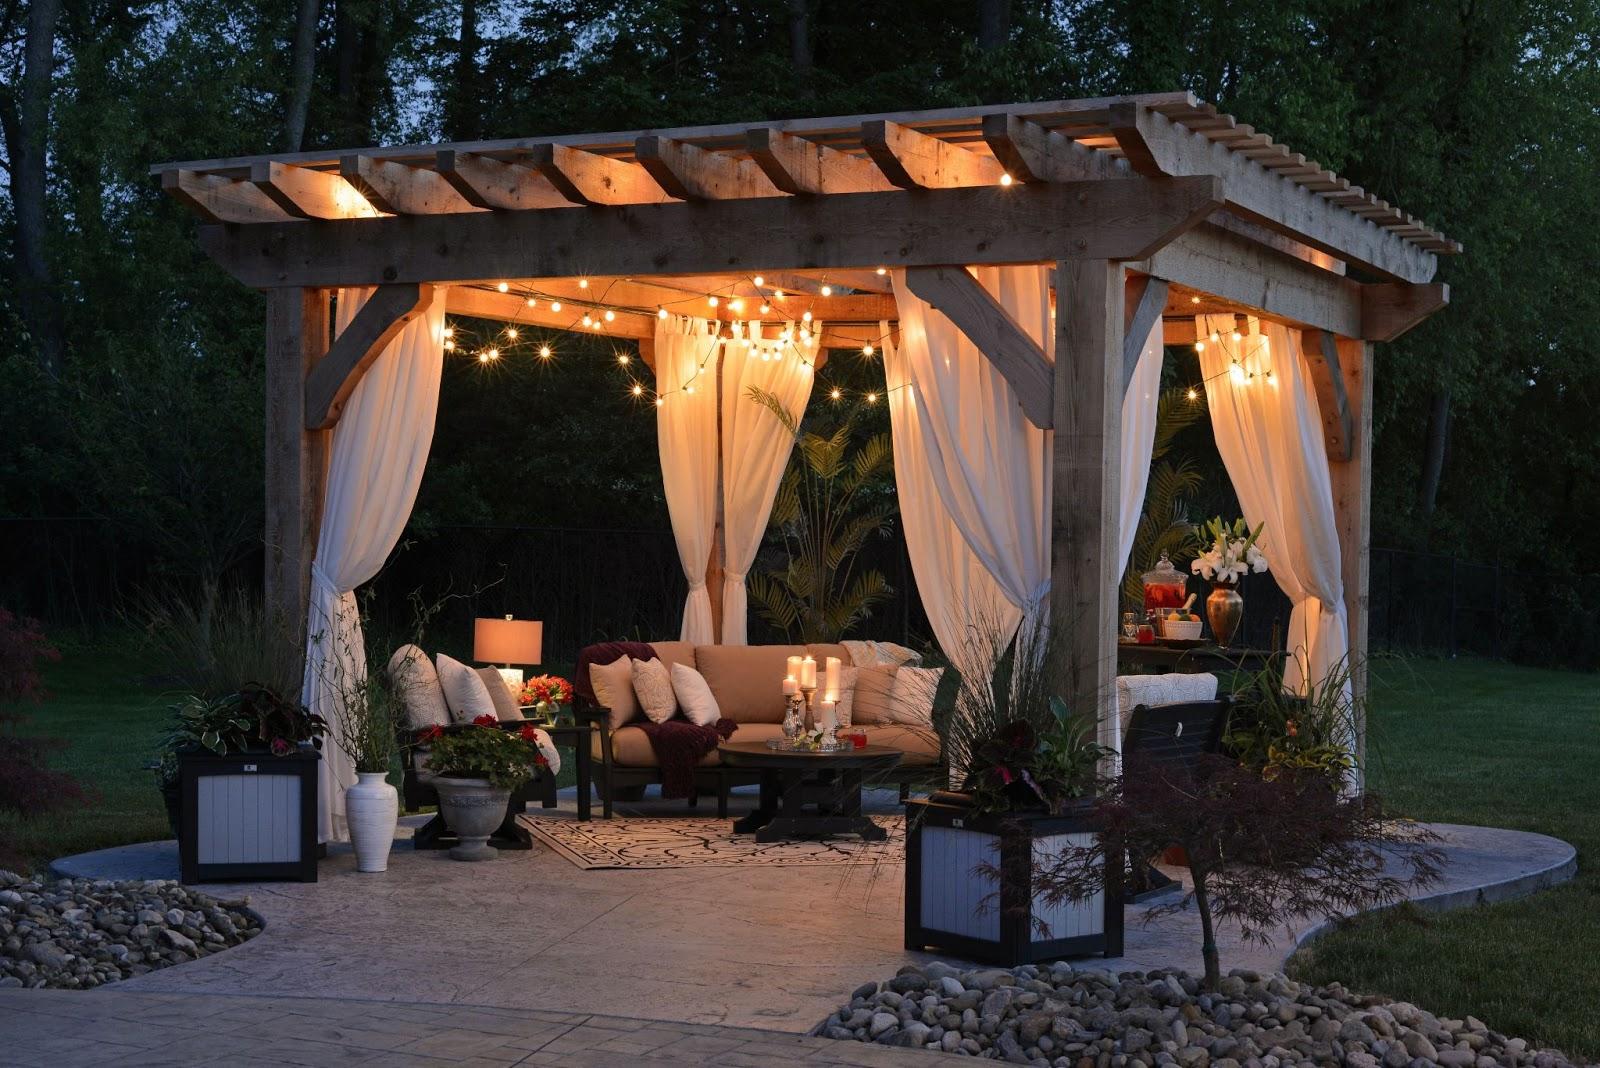 lighting to your backyard patio space